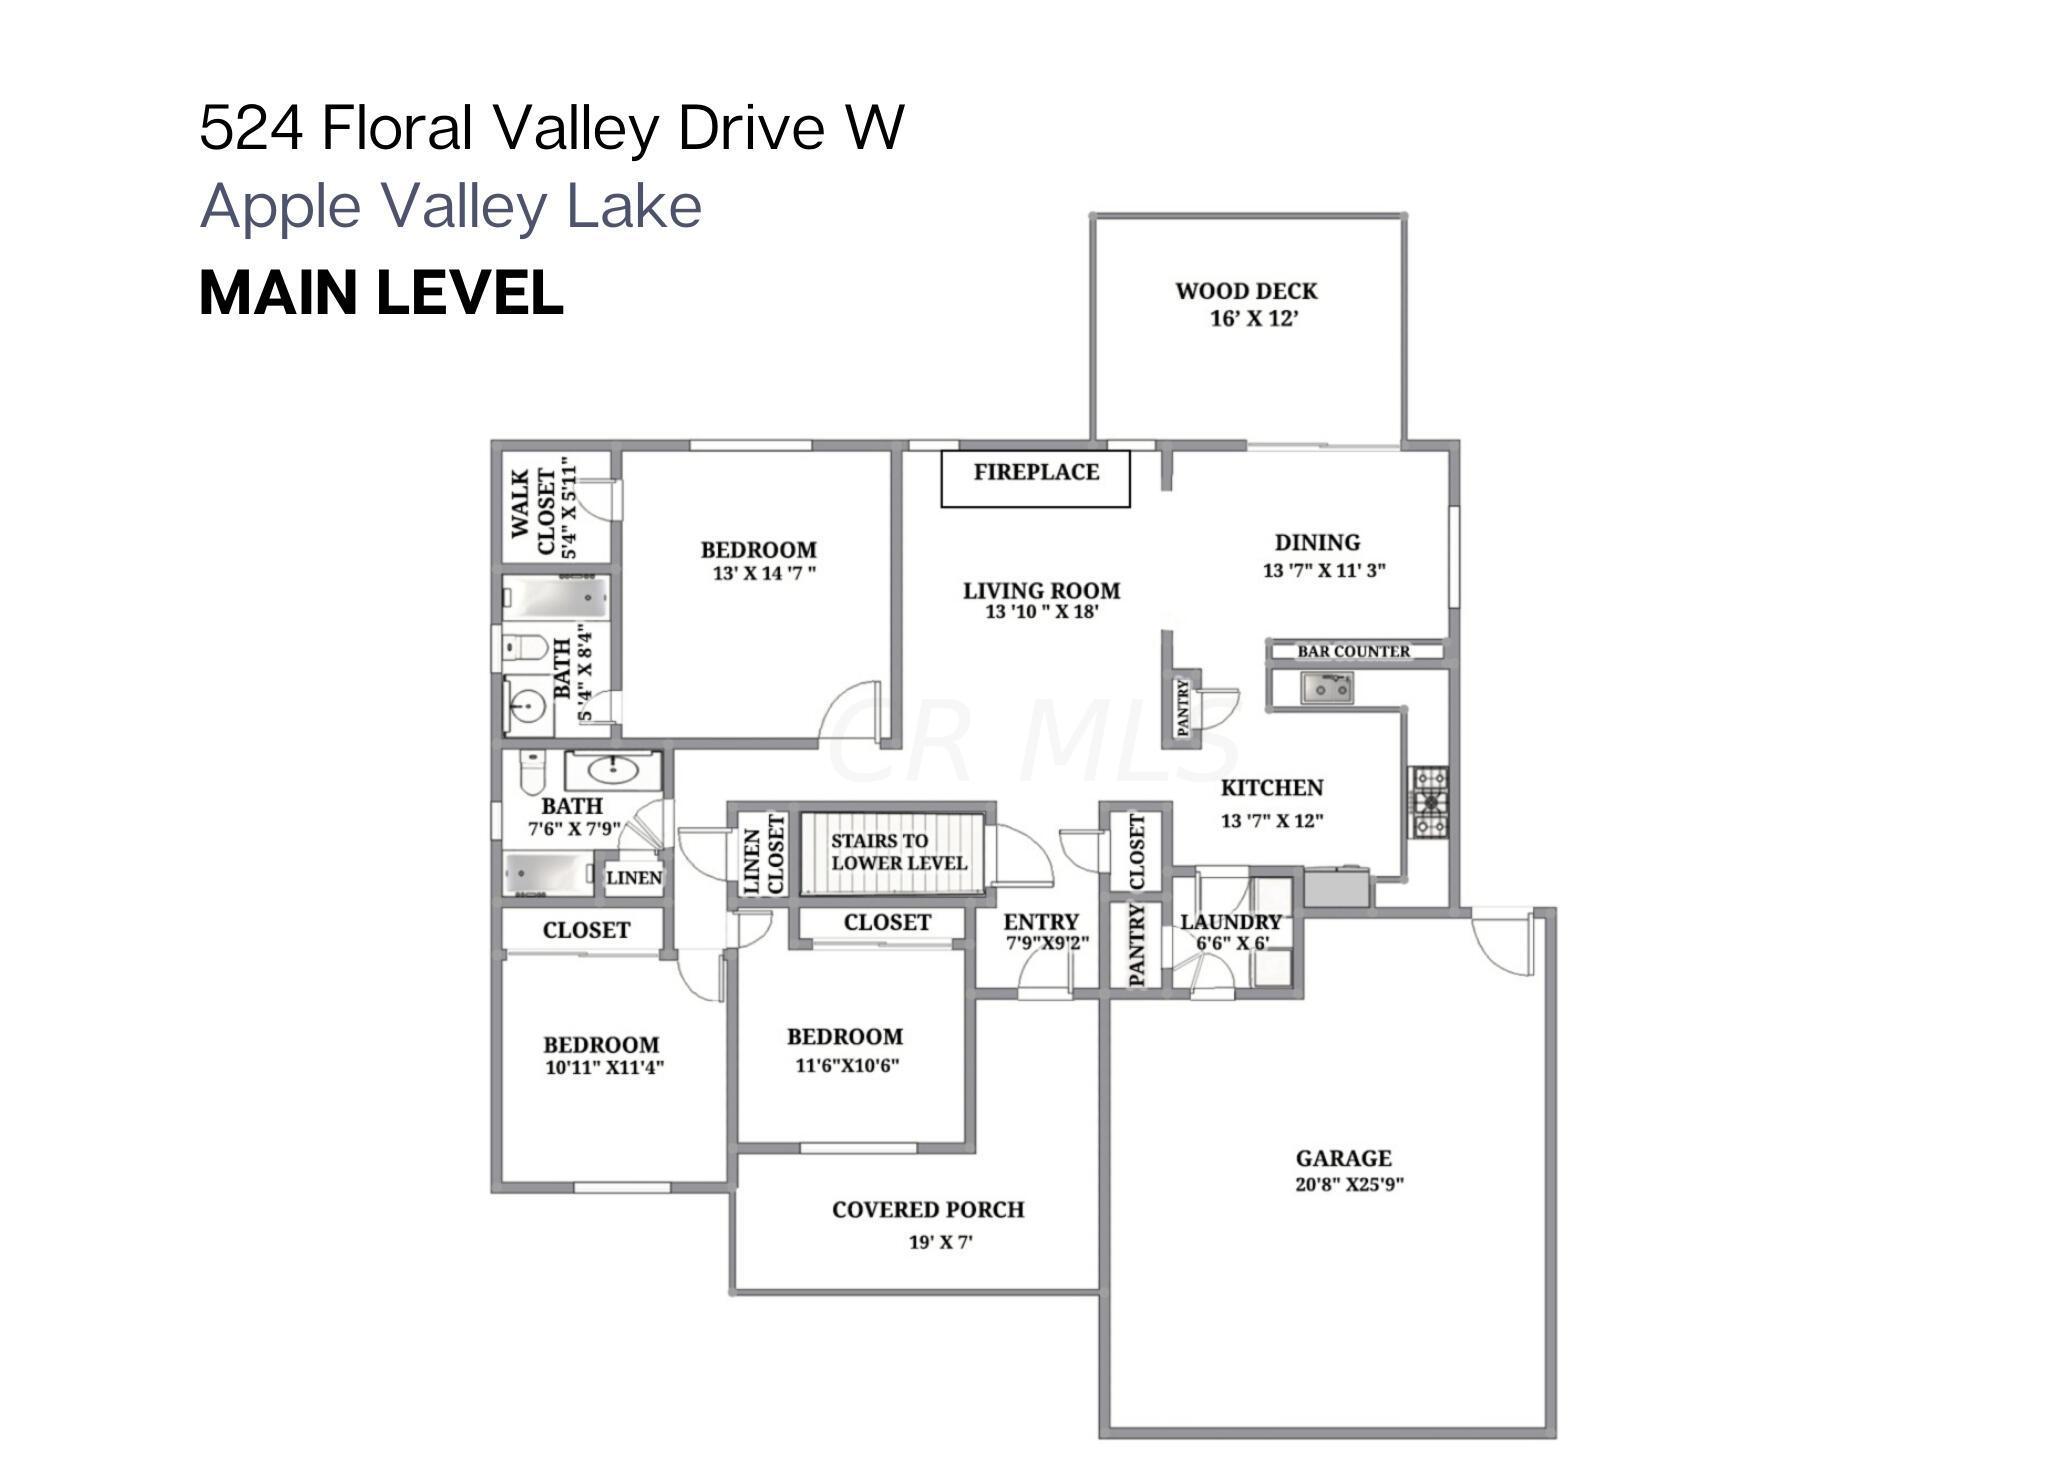 524 FVD - Main Level